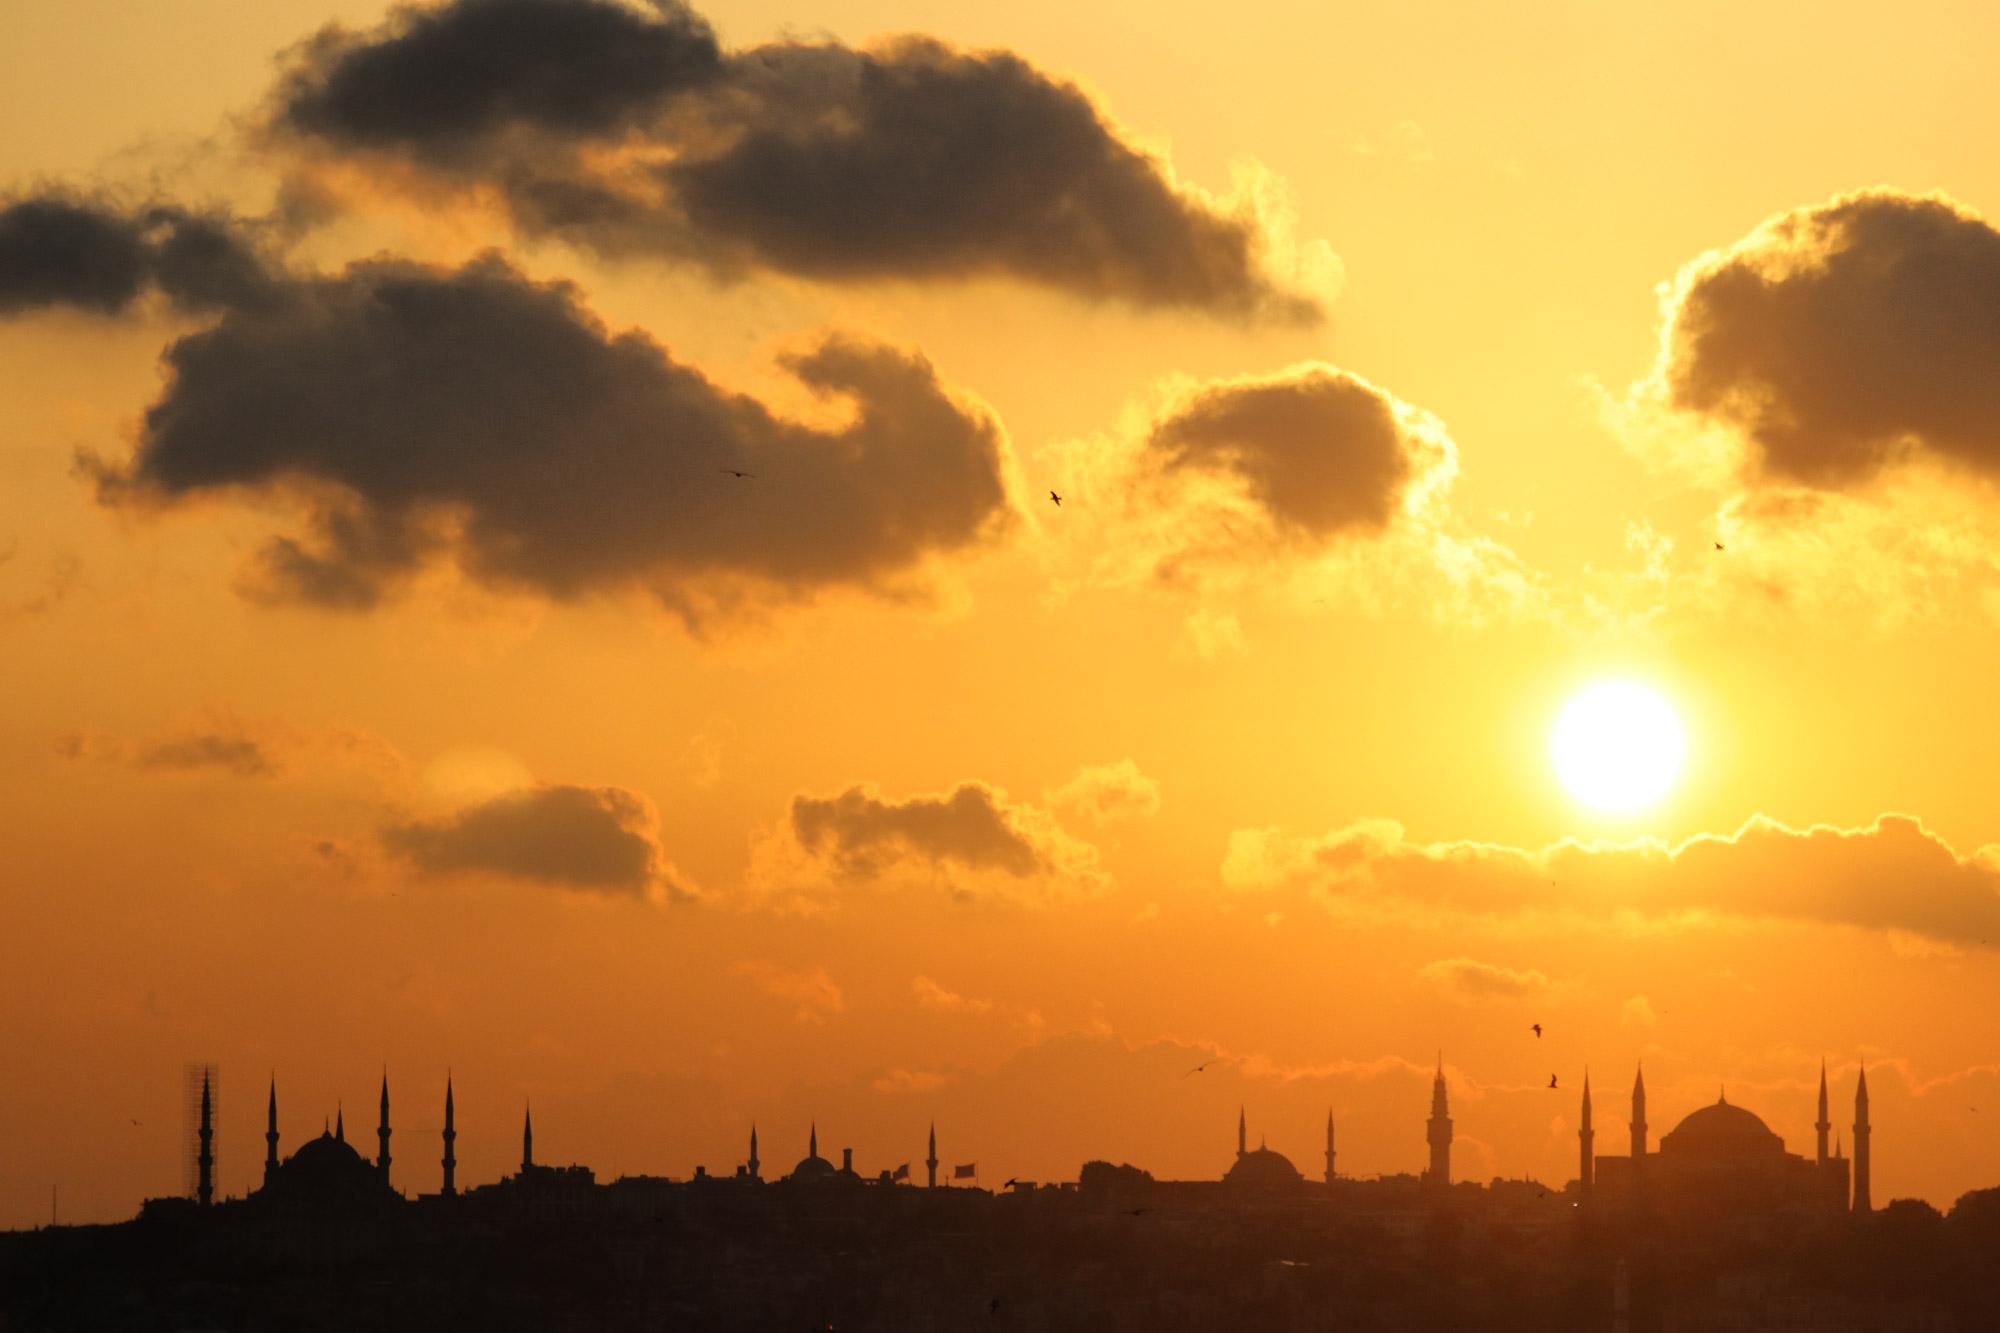 Mooiste reisfoto's 2018 - Istanbul